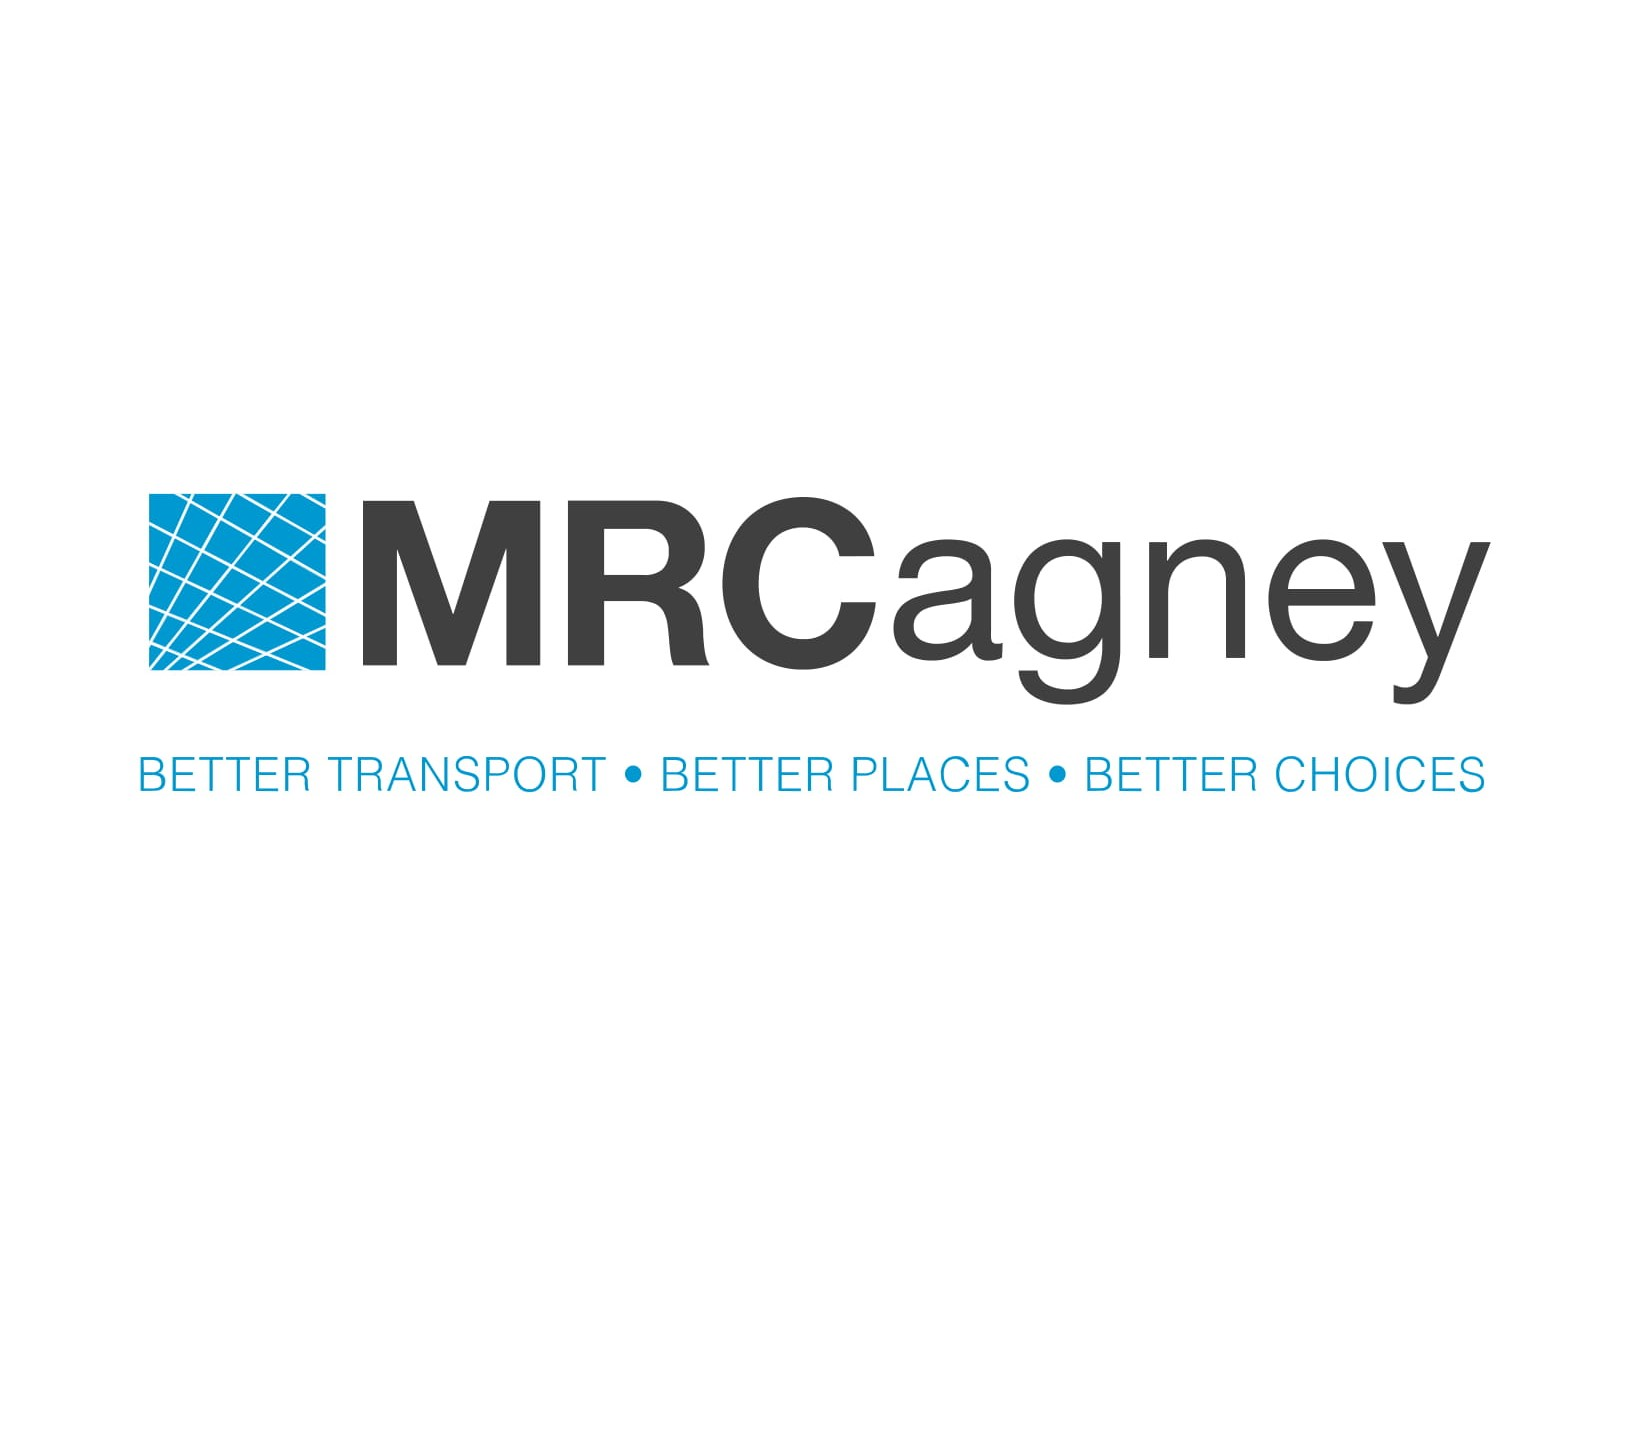 MRCagney